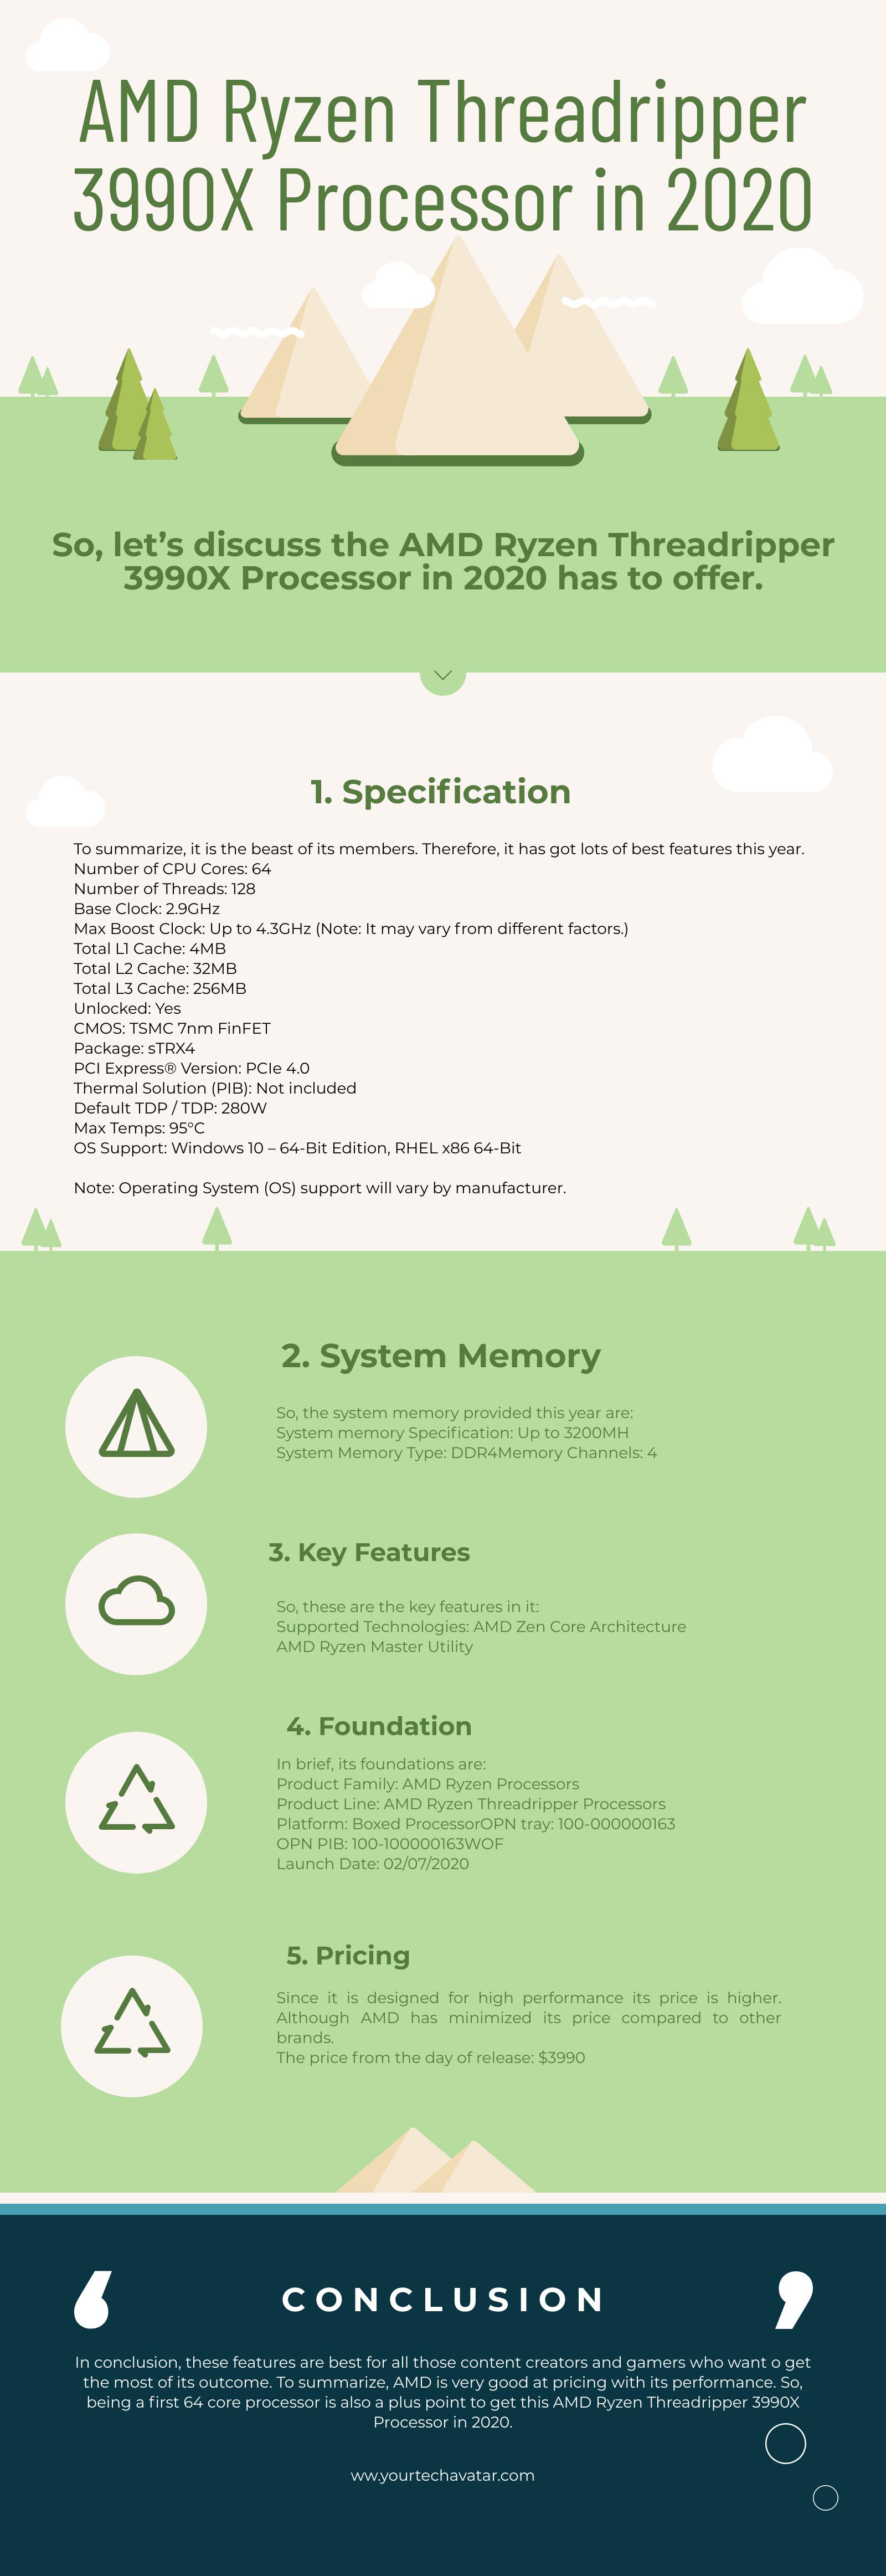 Infographic for AMD Ryzen Threadripper 3990X Processor in 2020